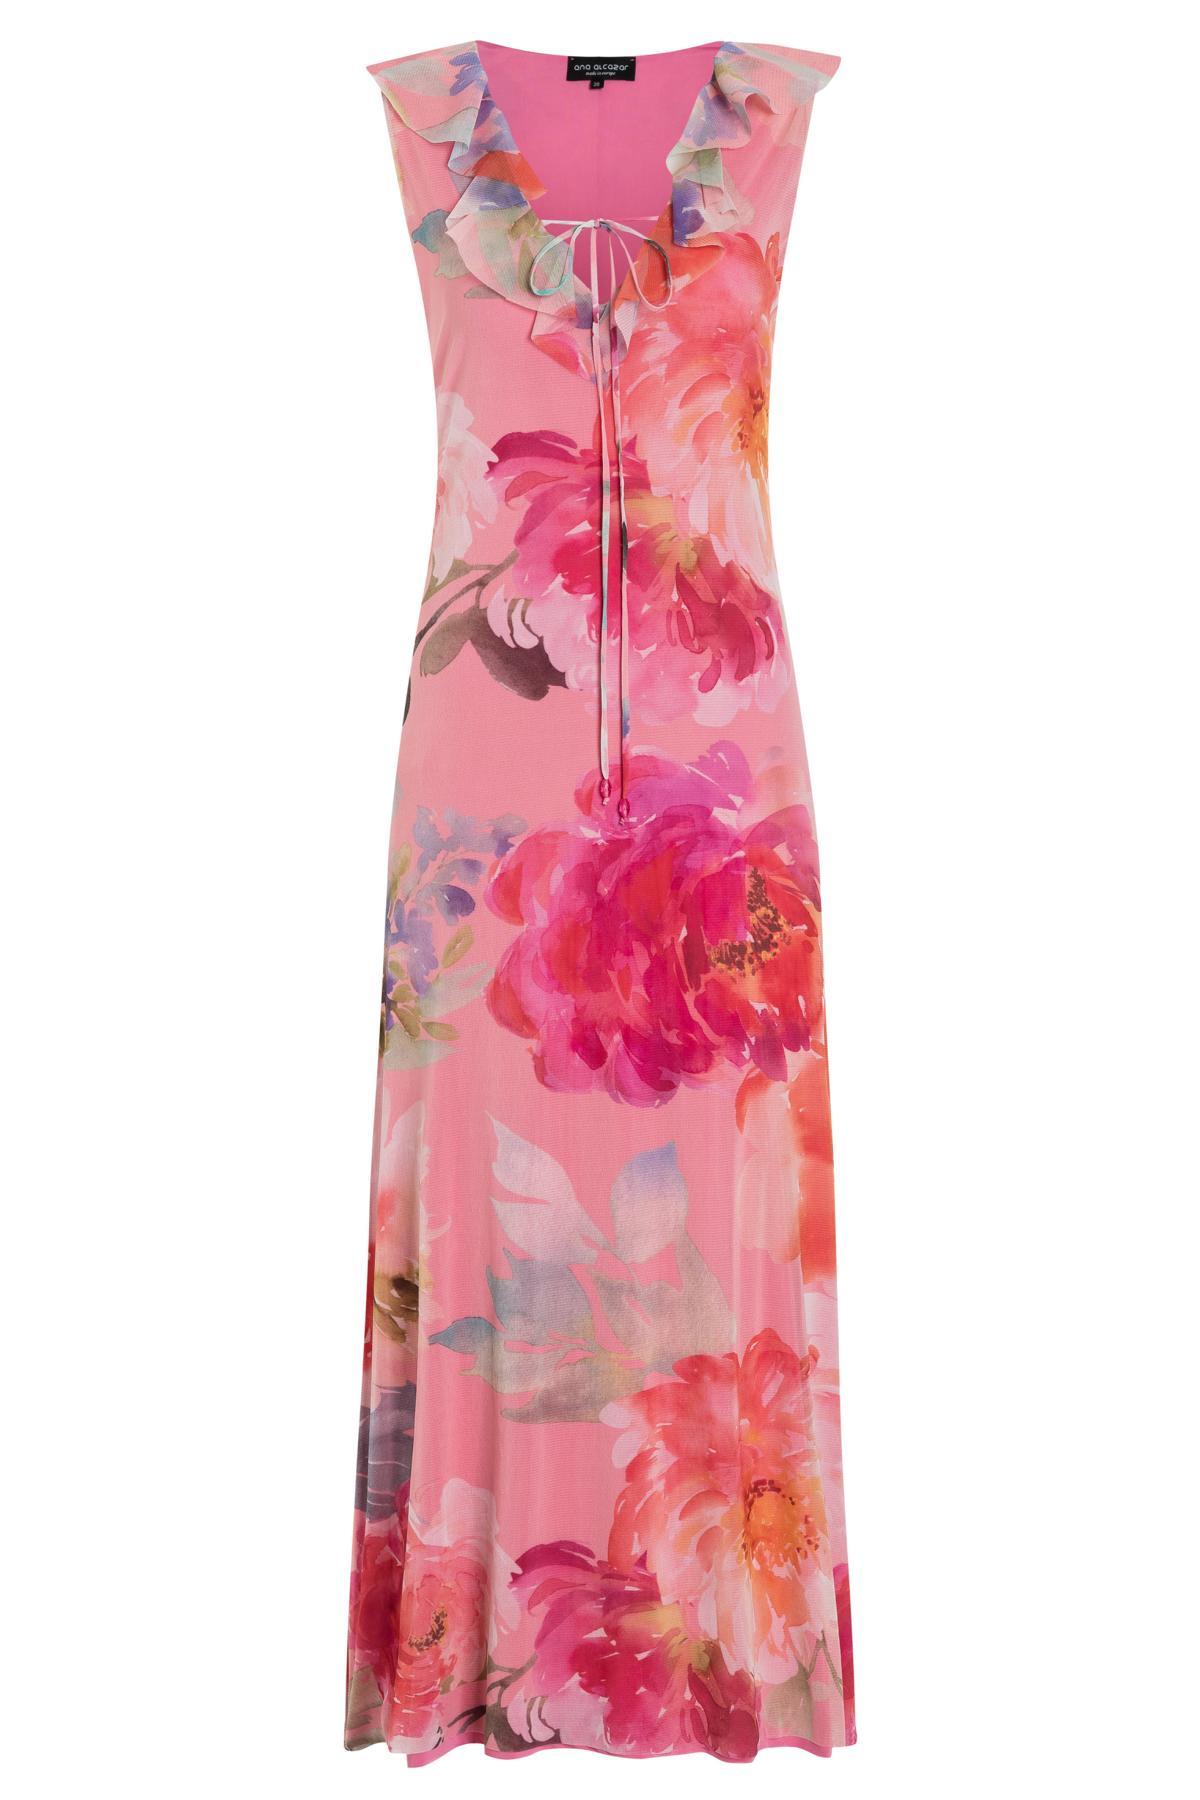 01523ff3c64168 Long Ruffle dress Tegusa from rose flower mesh